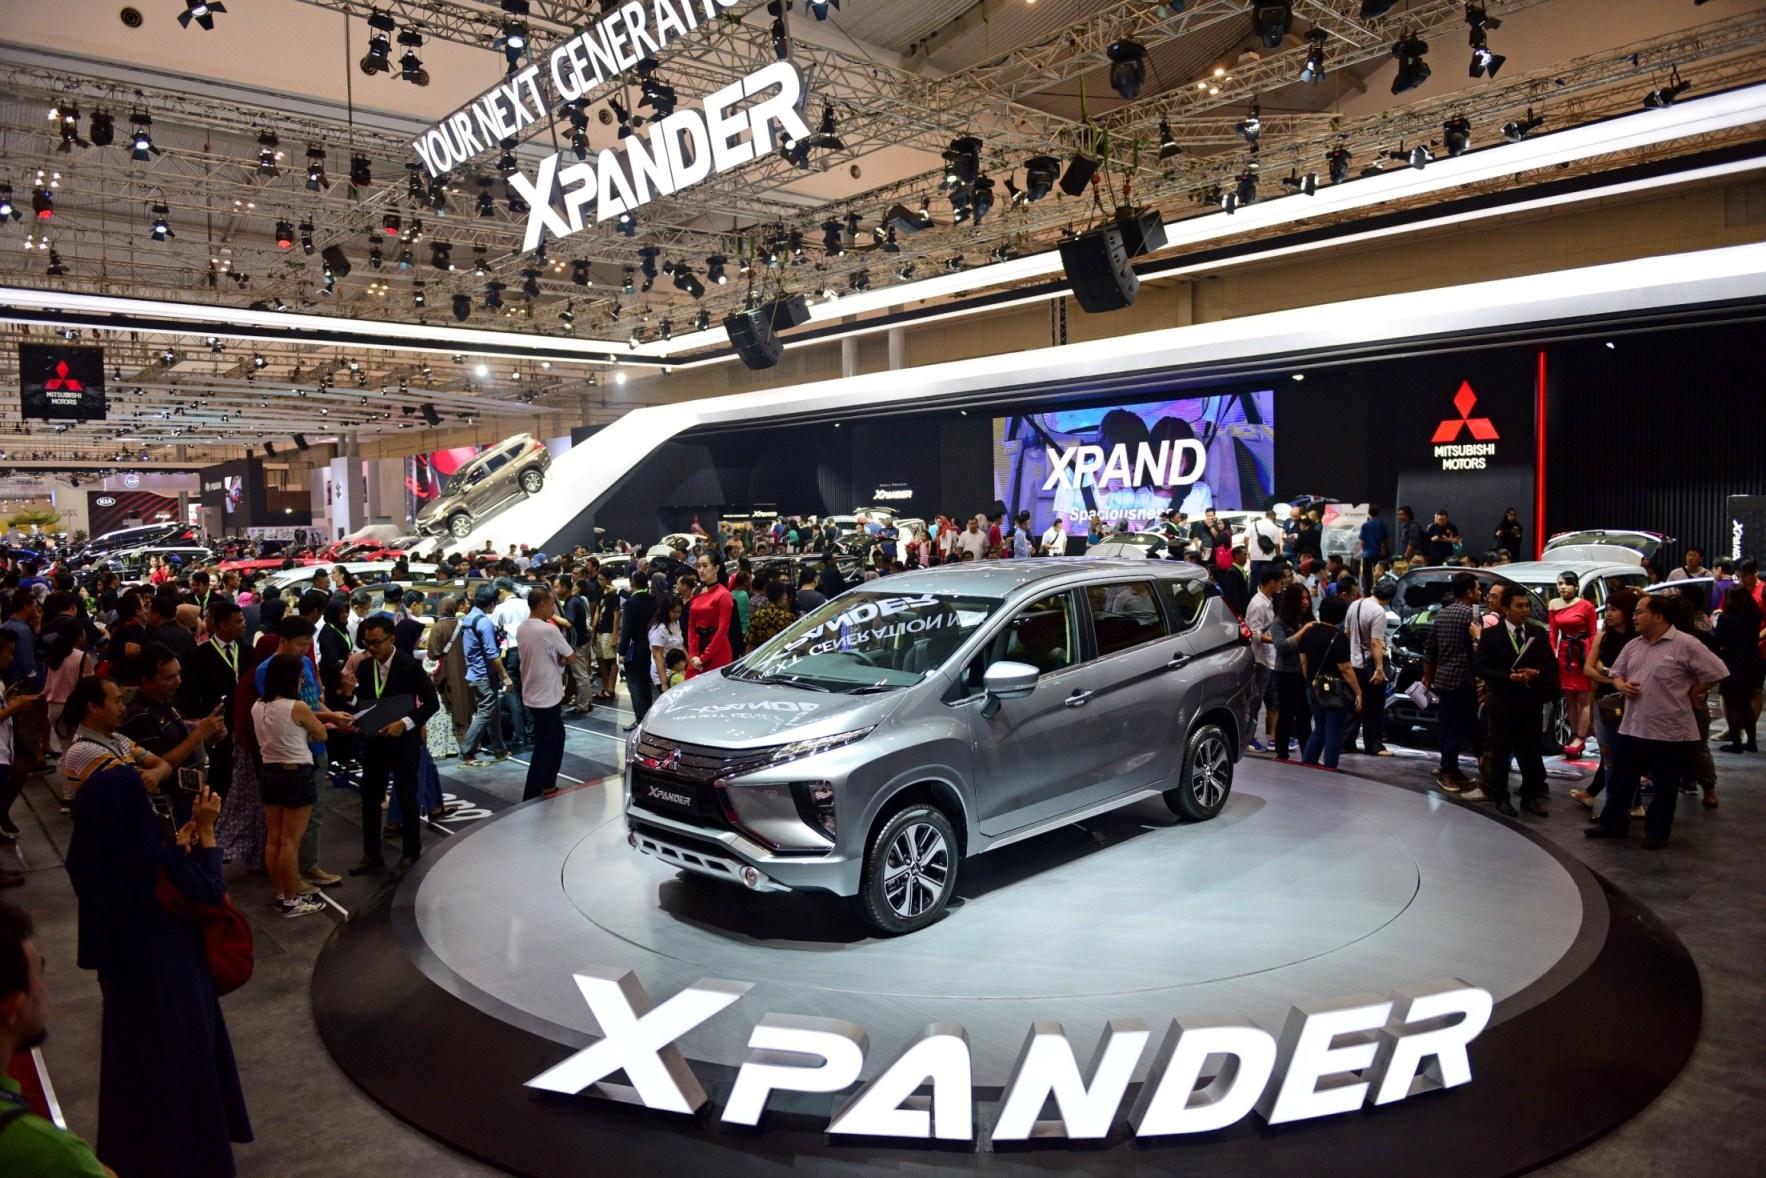 LAMPUNG POST | Mitsubishi Xpander Sabet Predikat Kendaraan Penumpang Favorit di GIIAS 2017